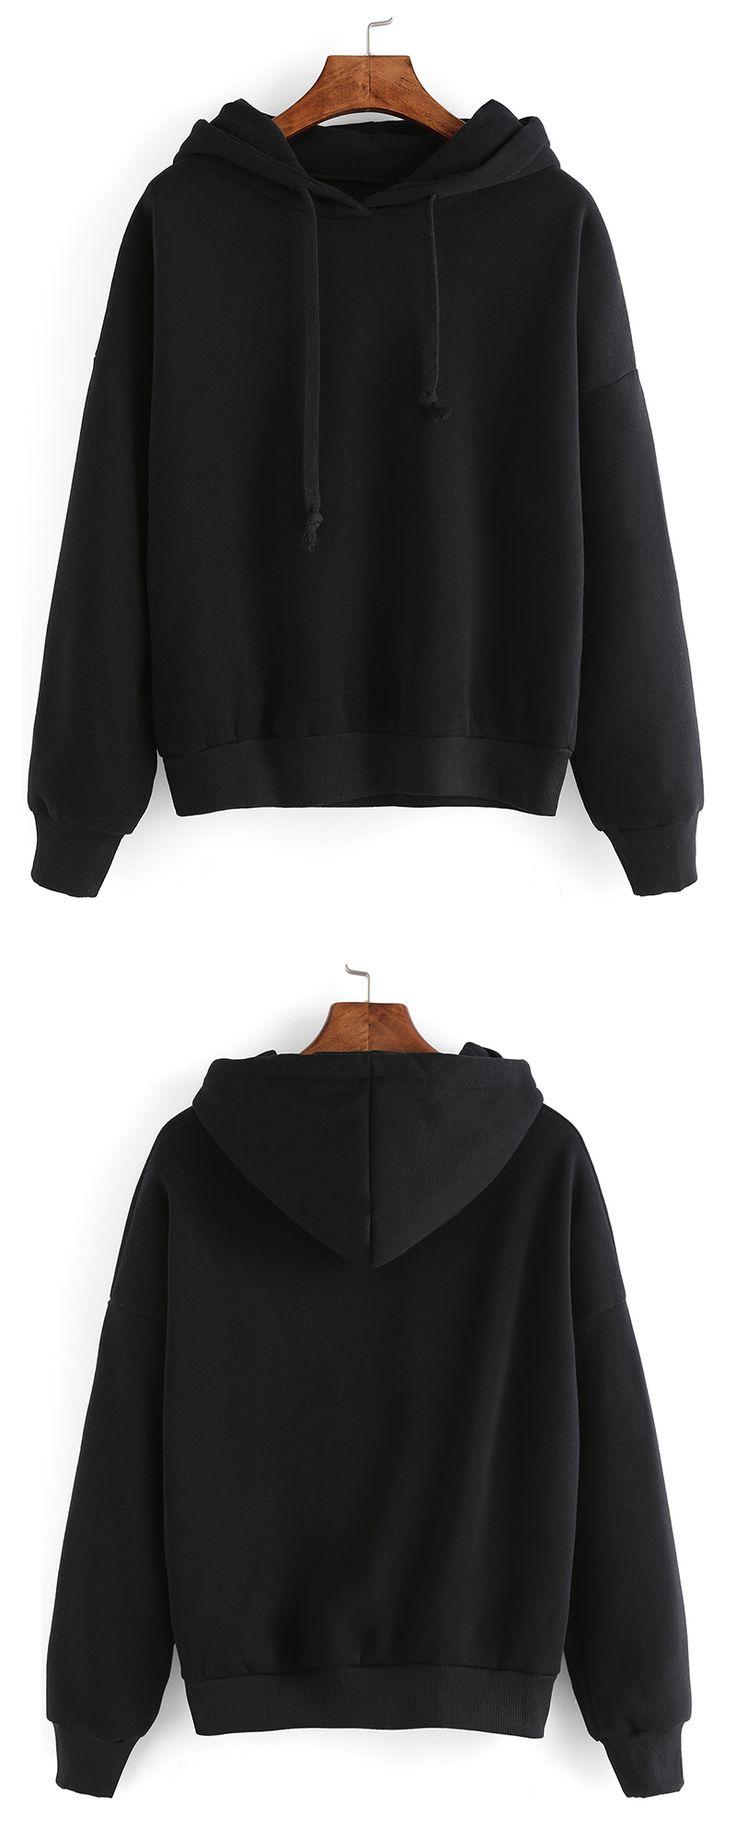 Black Hooded Long Sleeve Crop Sweatshirt - m.shein.com cute styles, fashion styles